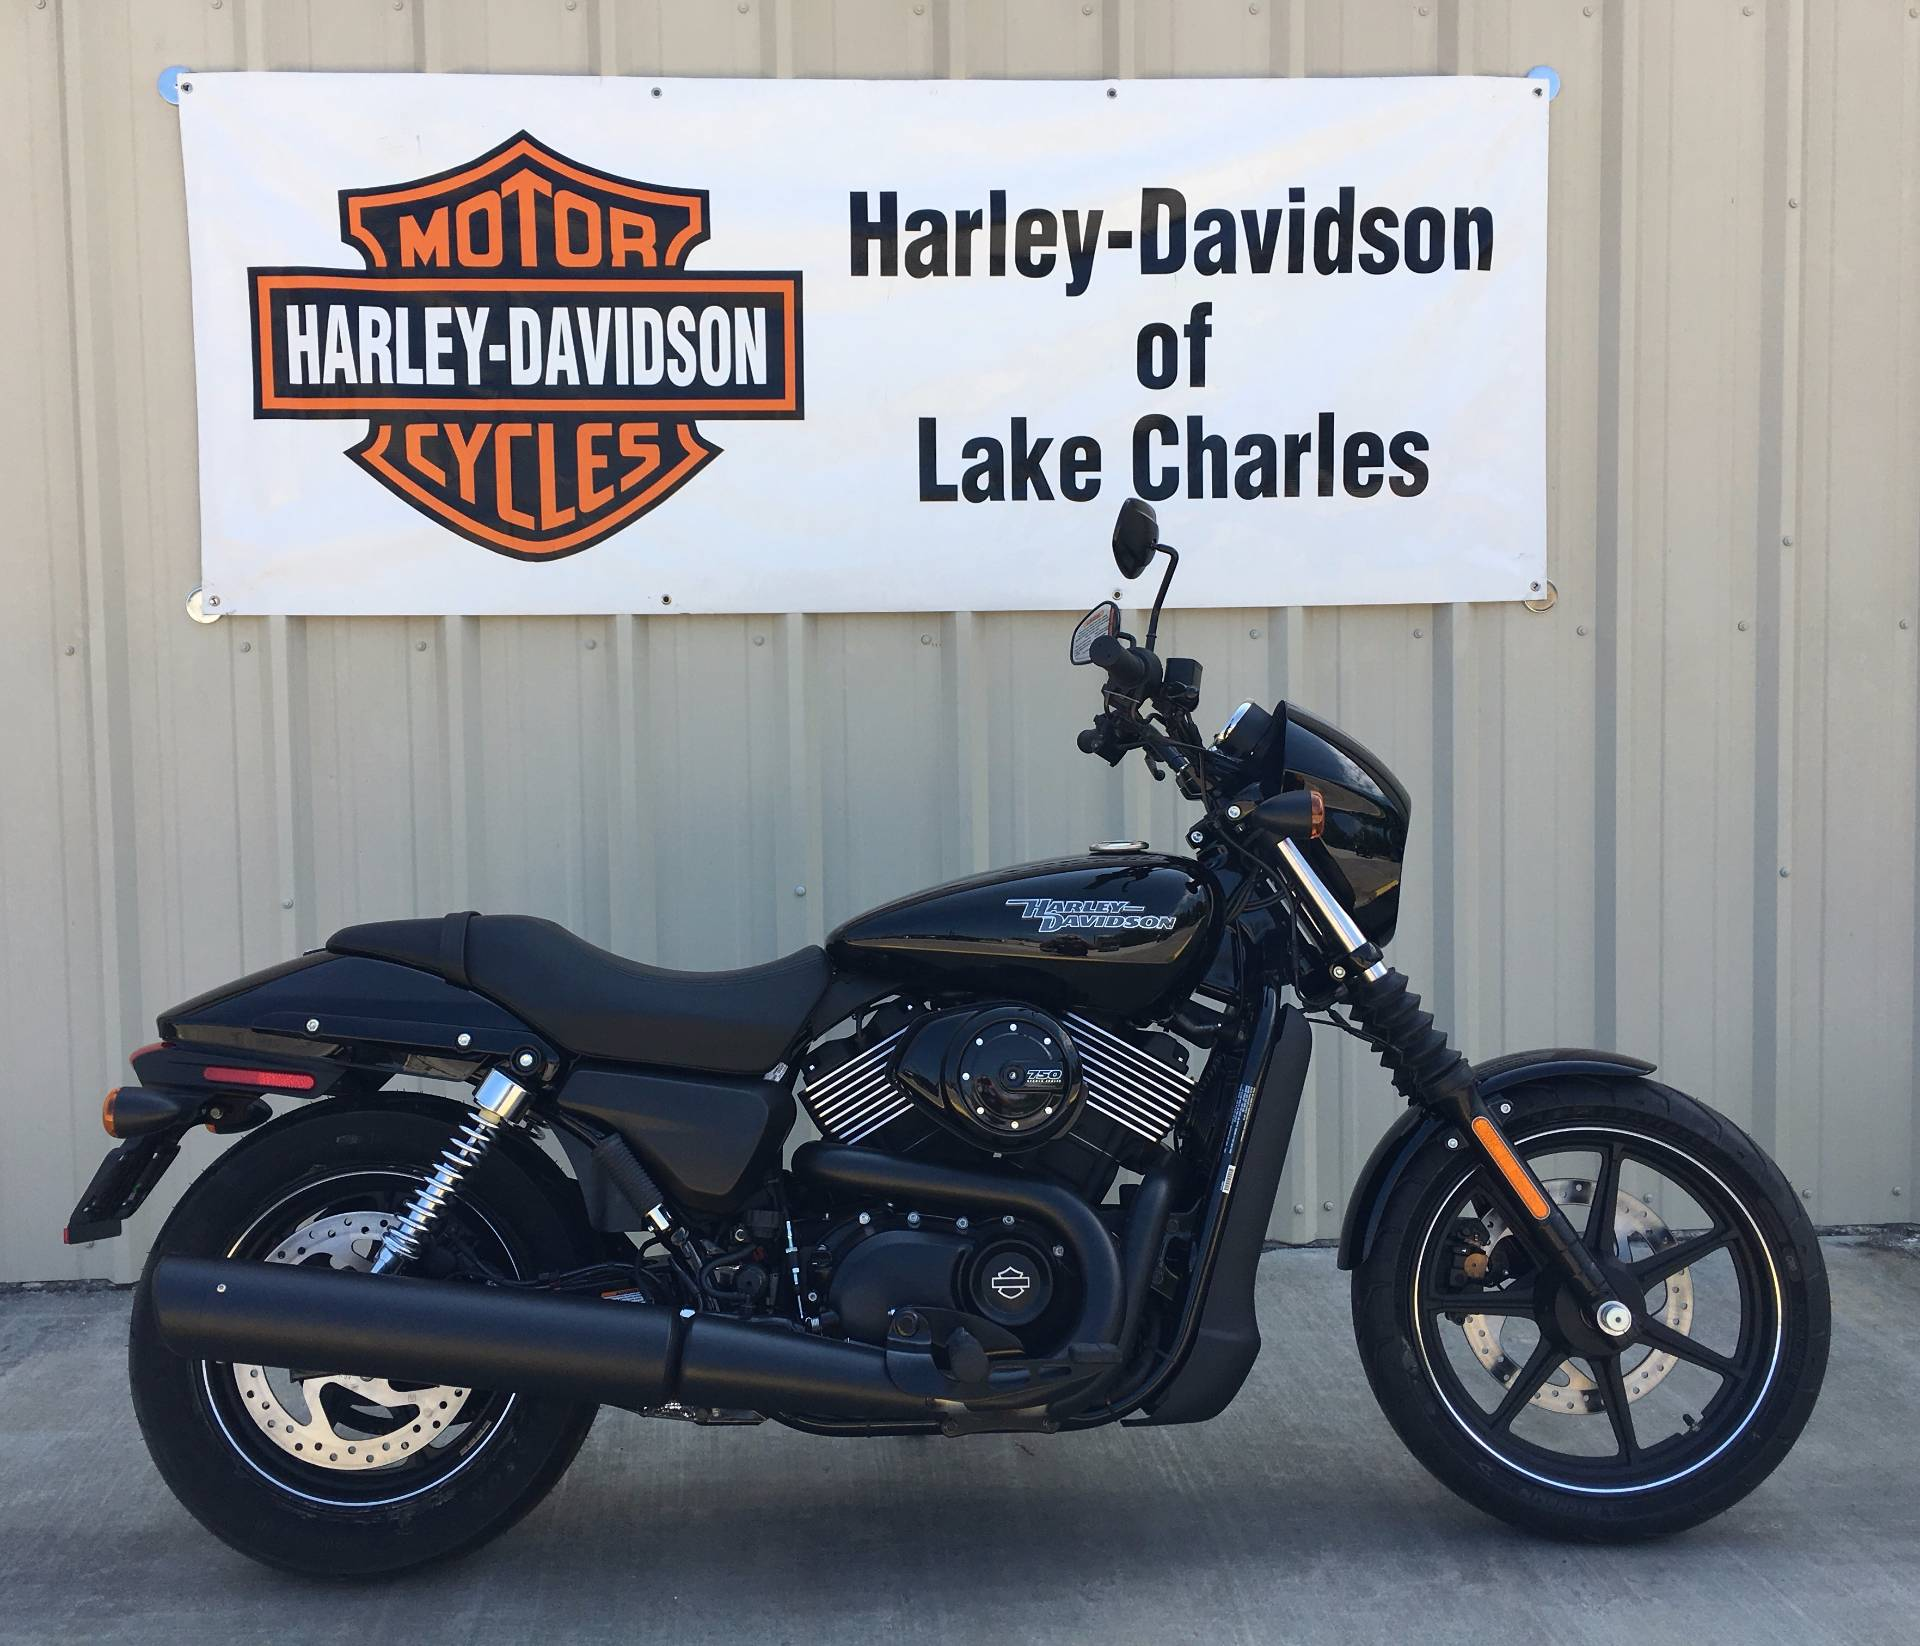 new 2017 harley davidson street 750 motorcycles in lake charles la stock number 502031. Black Bedroom Furniture Sets. Home Design Ideas